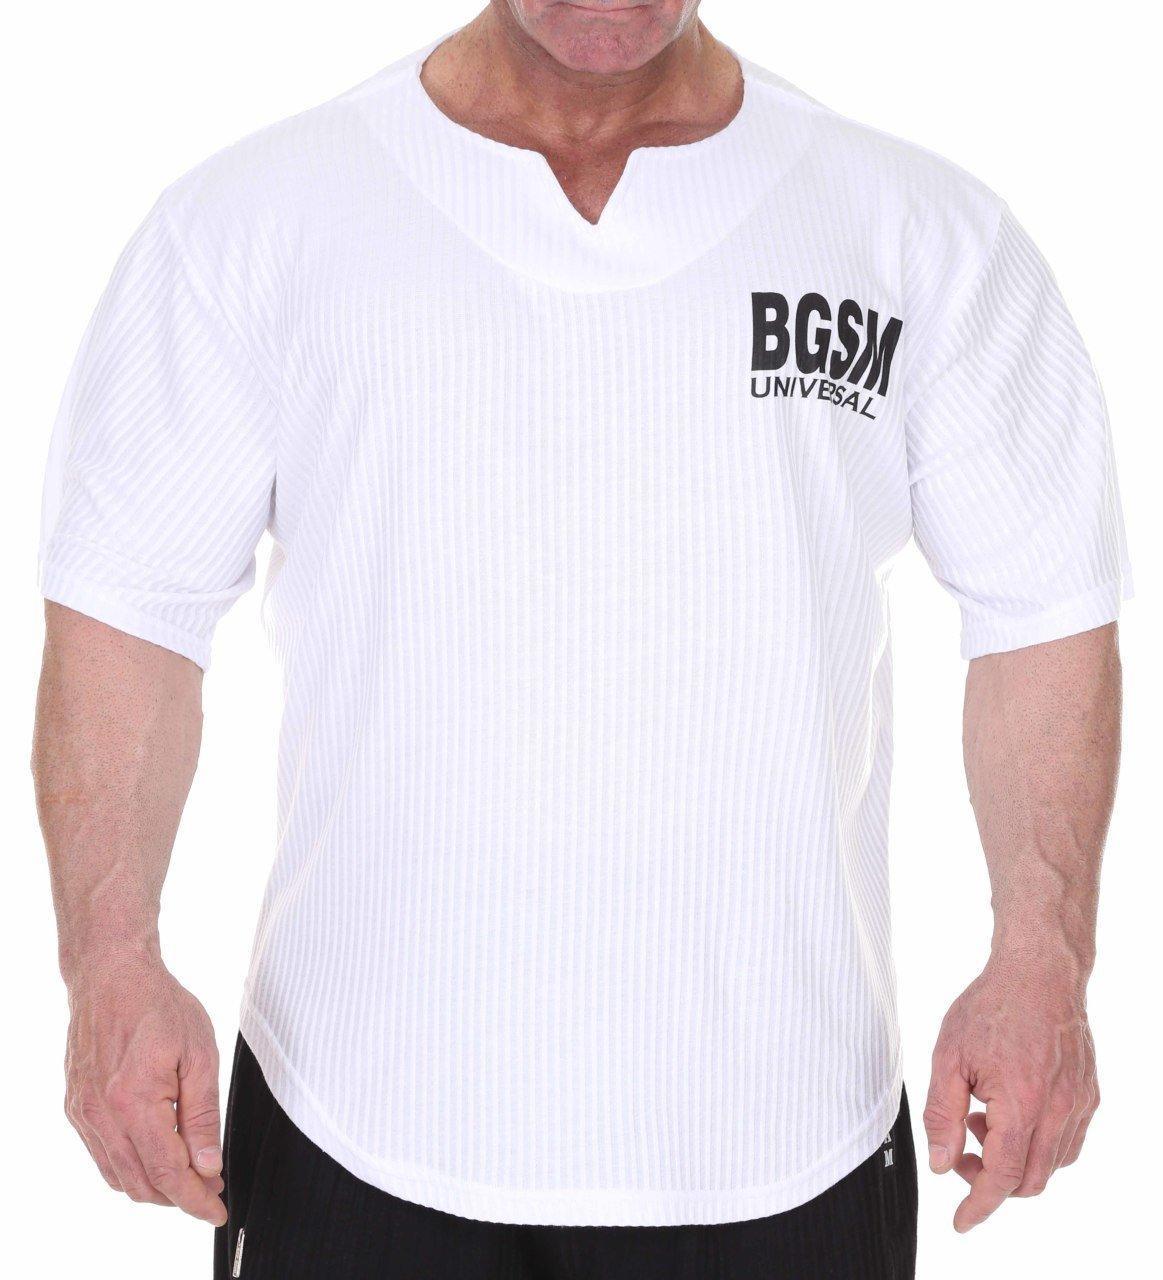 Футболка белая BigSam 3281 размер M